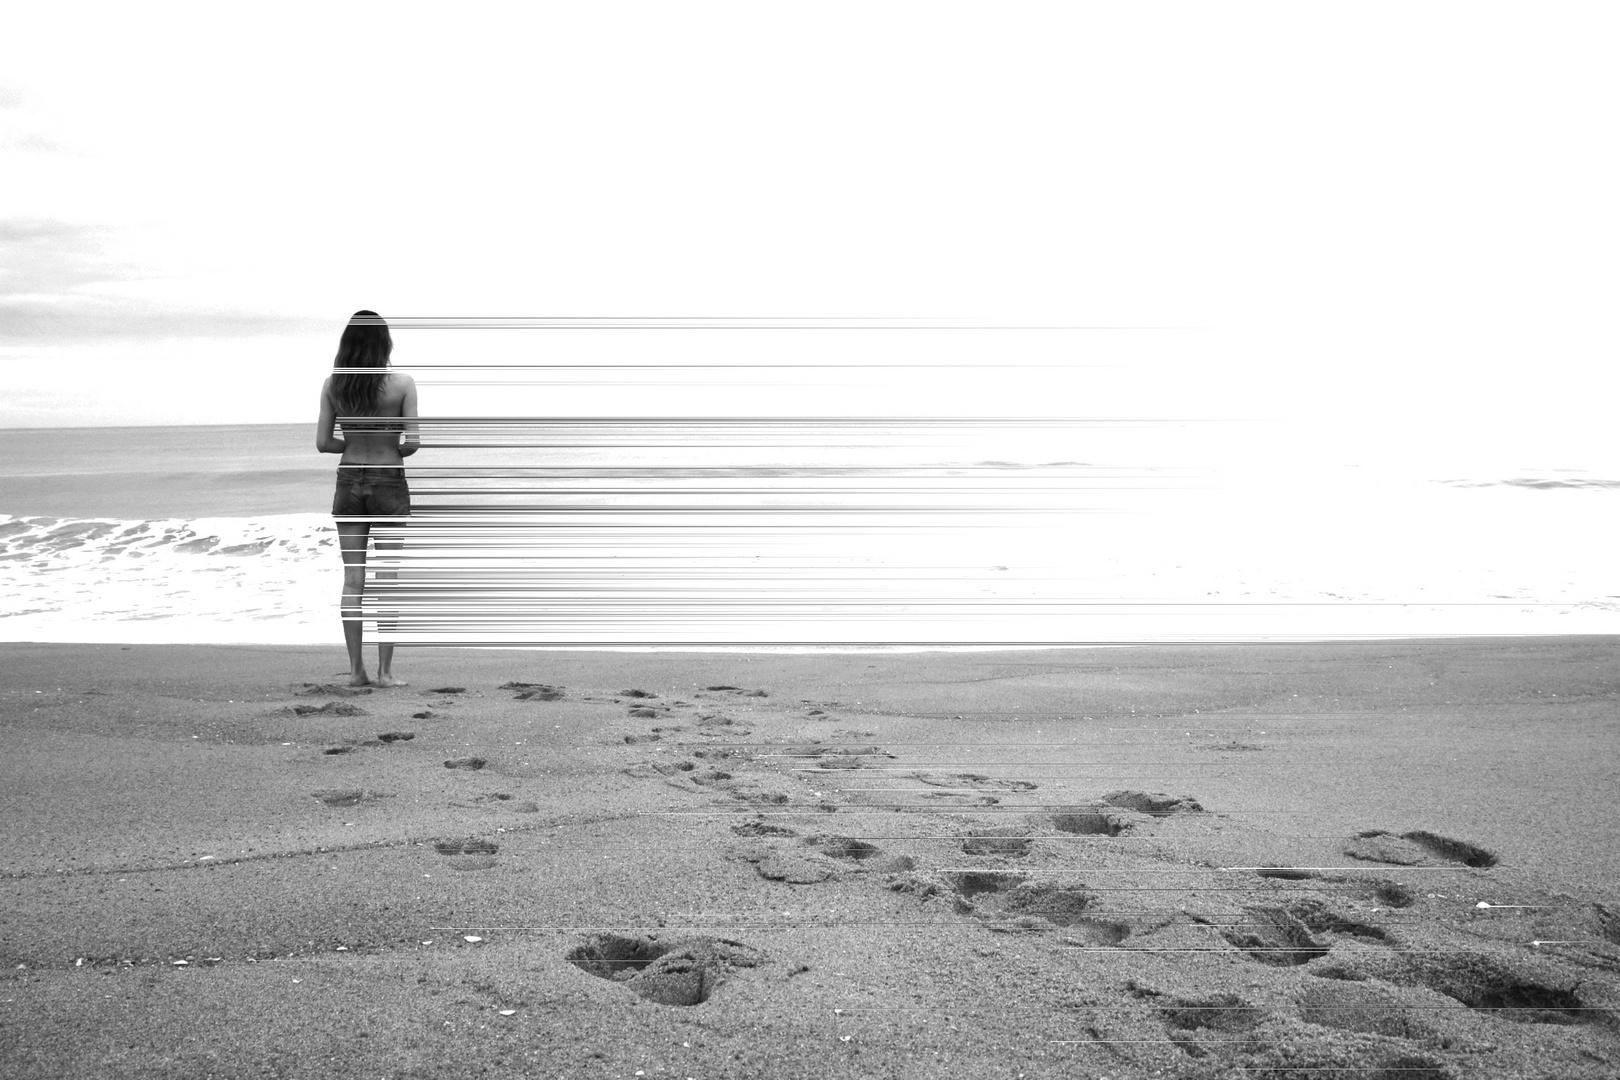 Fading away...